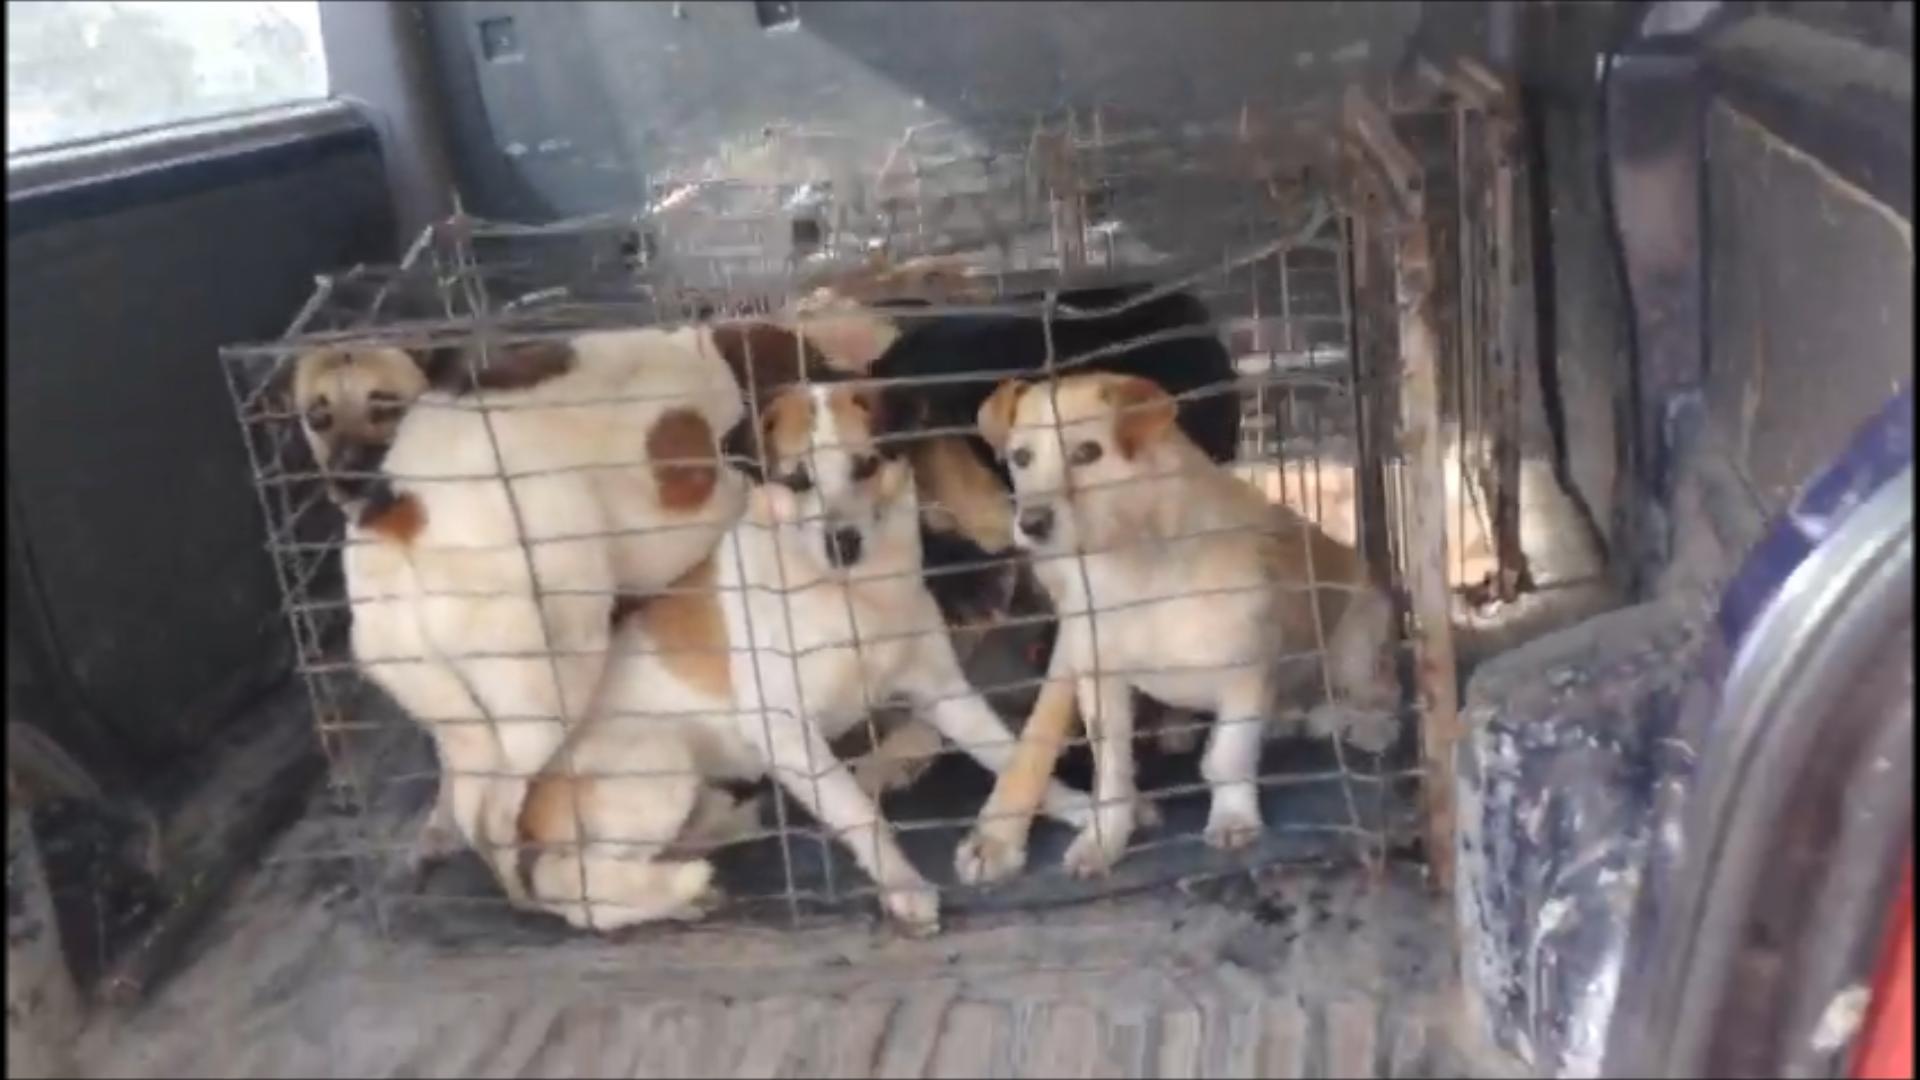 Maxi operatie de capturare a cainilor fara stapan din Cernavoda: o noua provocare pentru Save the Dogs